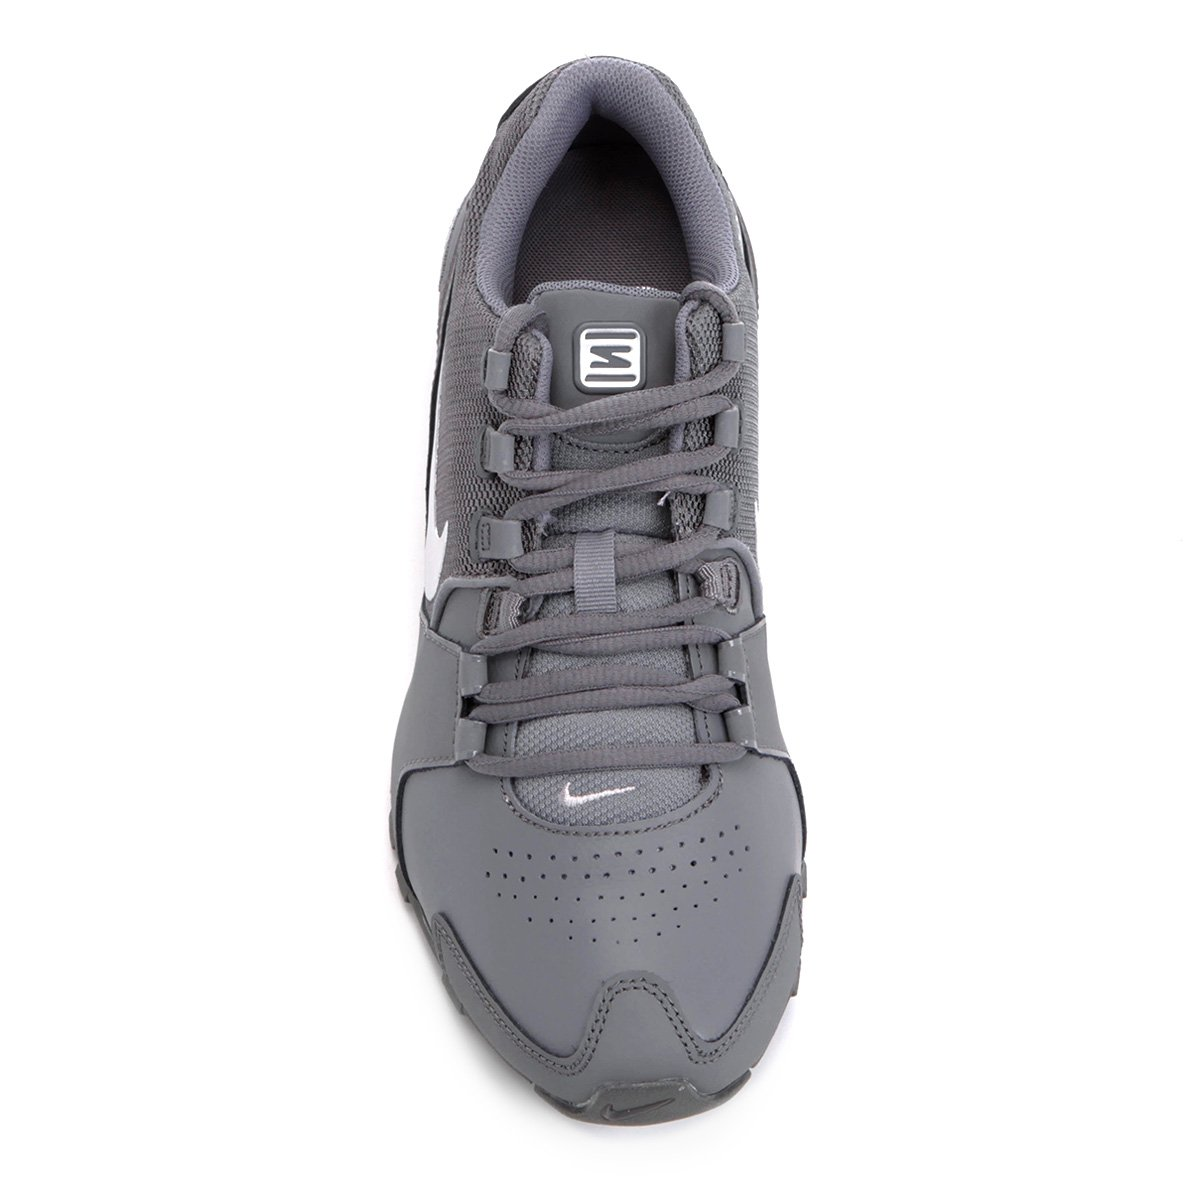 Nike LTR Couro Nike Avenue Avenue Cinza Masculino Shox Shox Tênis Couro Tênis xXqY1g1z